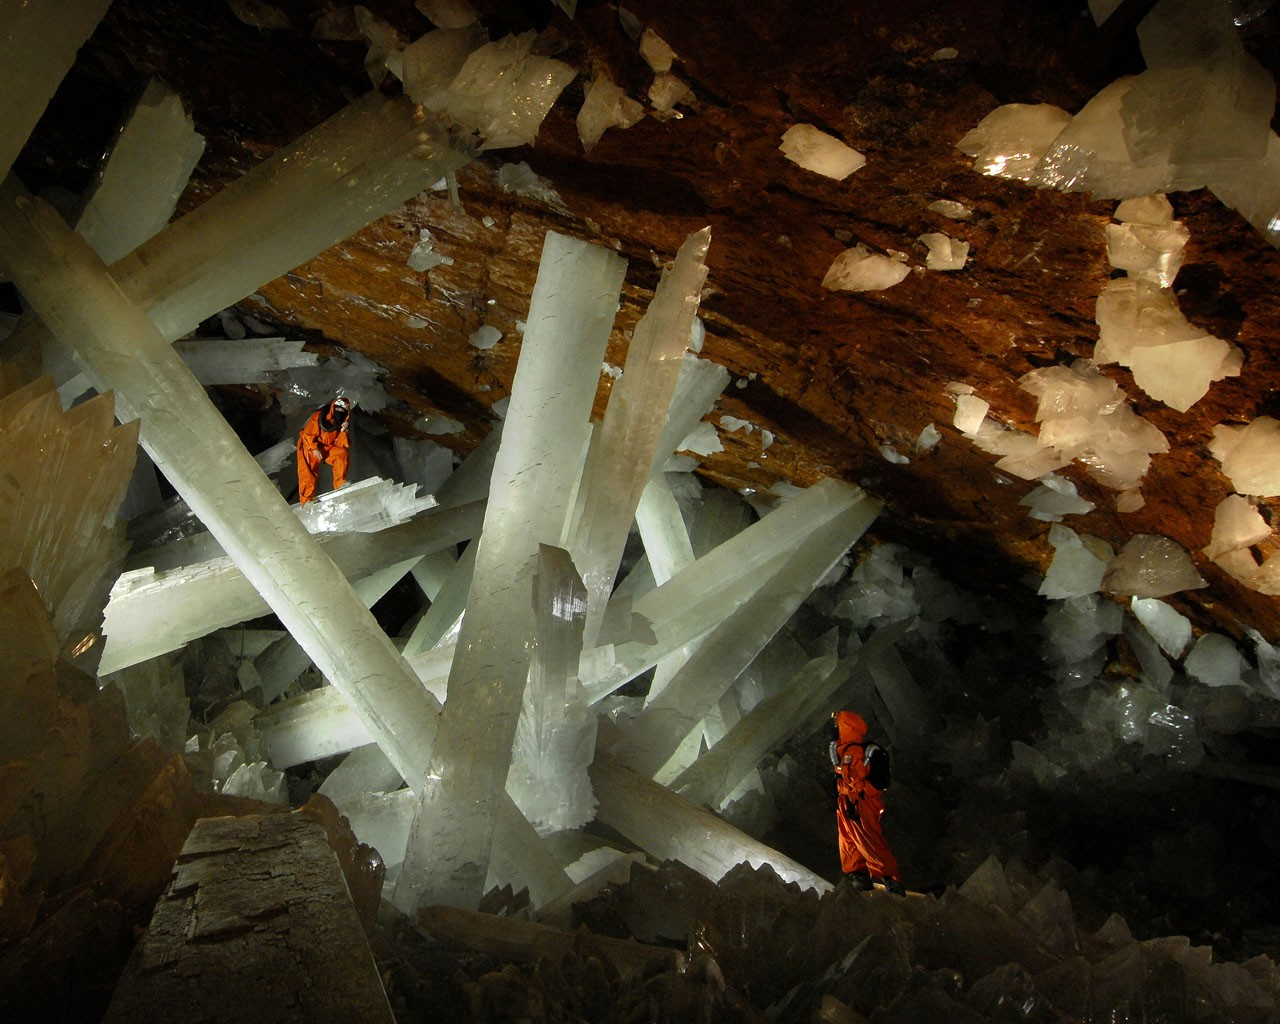 http://2.bp.blogspot.com/-W-NiqH-1rVE/T0lvHCfX4jI/AAAAAAAACZg/MOmGWKuqr-g/s1600/crystal_cave_mexico_picture_4.jpg